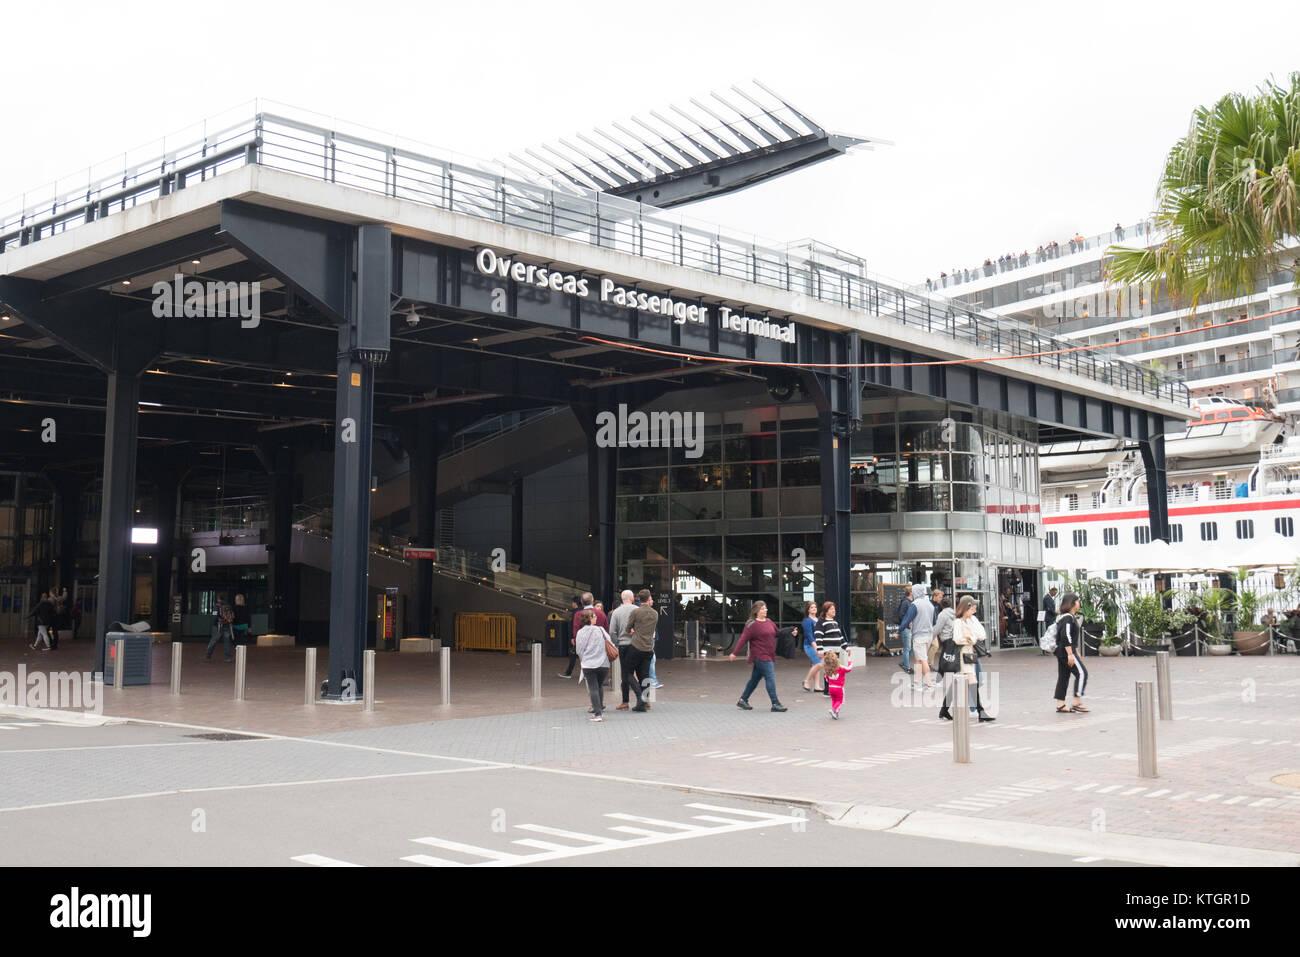 Sydney circular quay ferry terminal - Stock Image